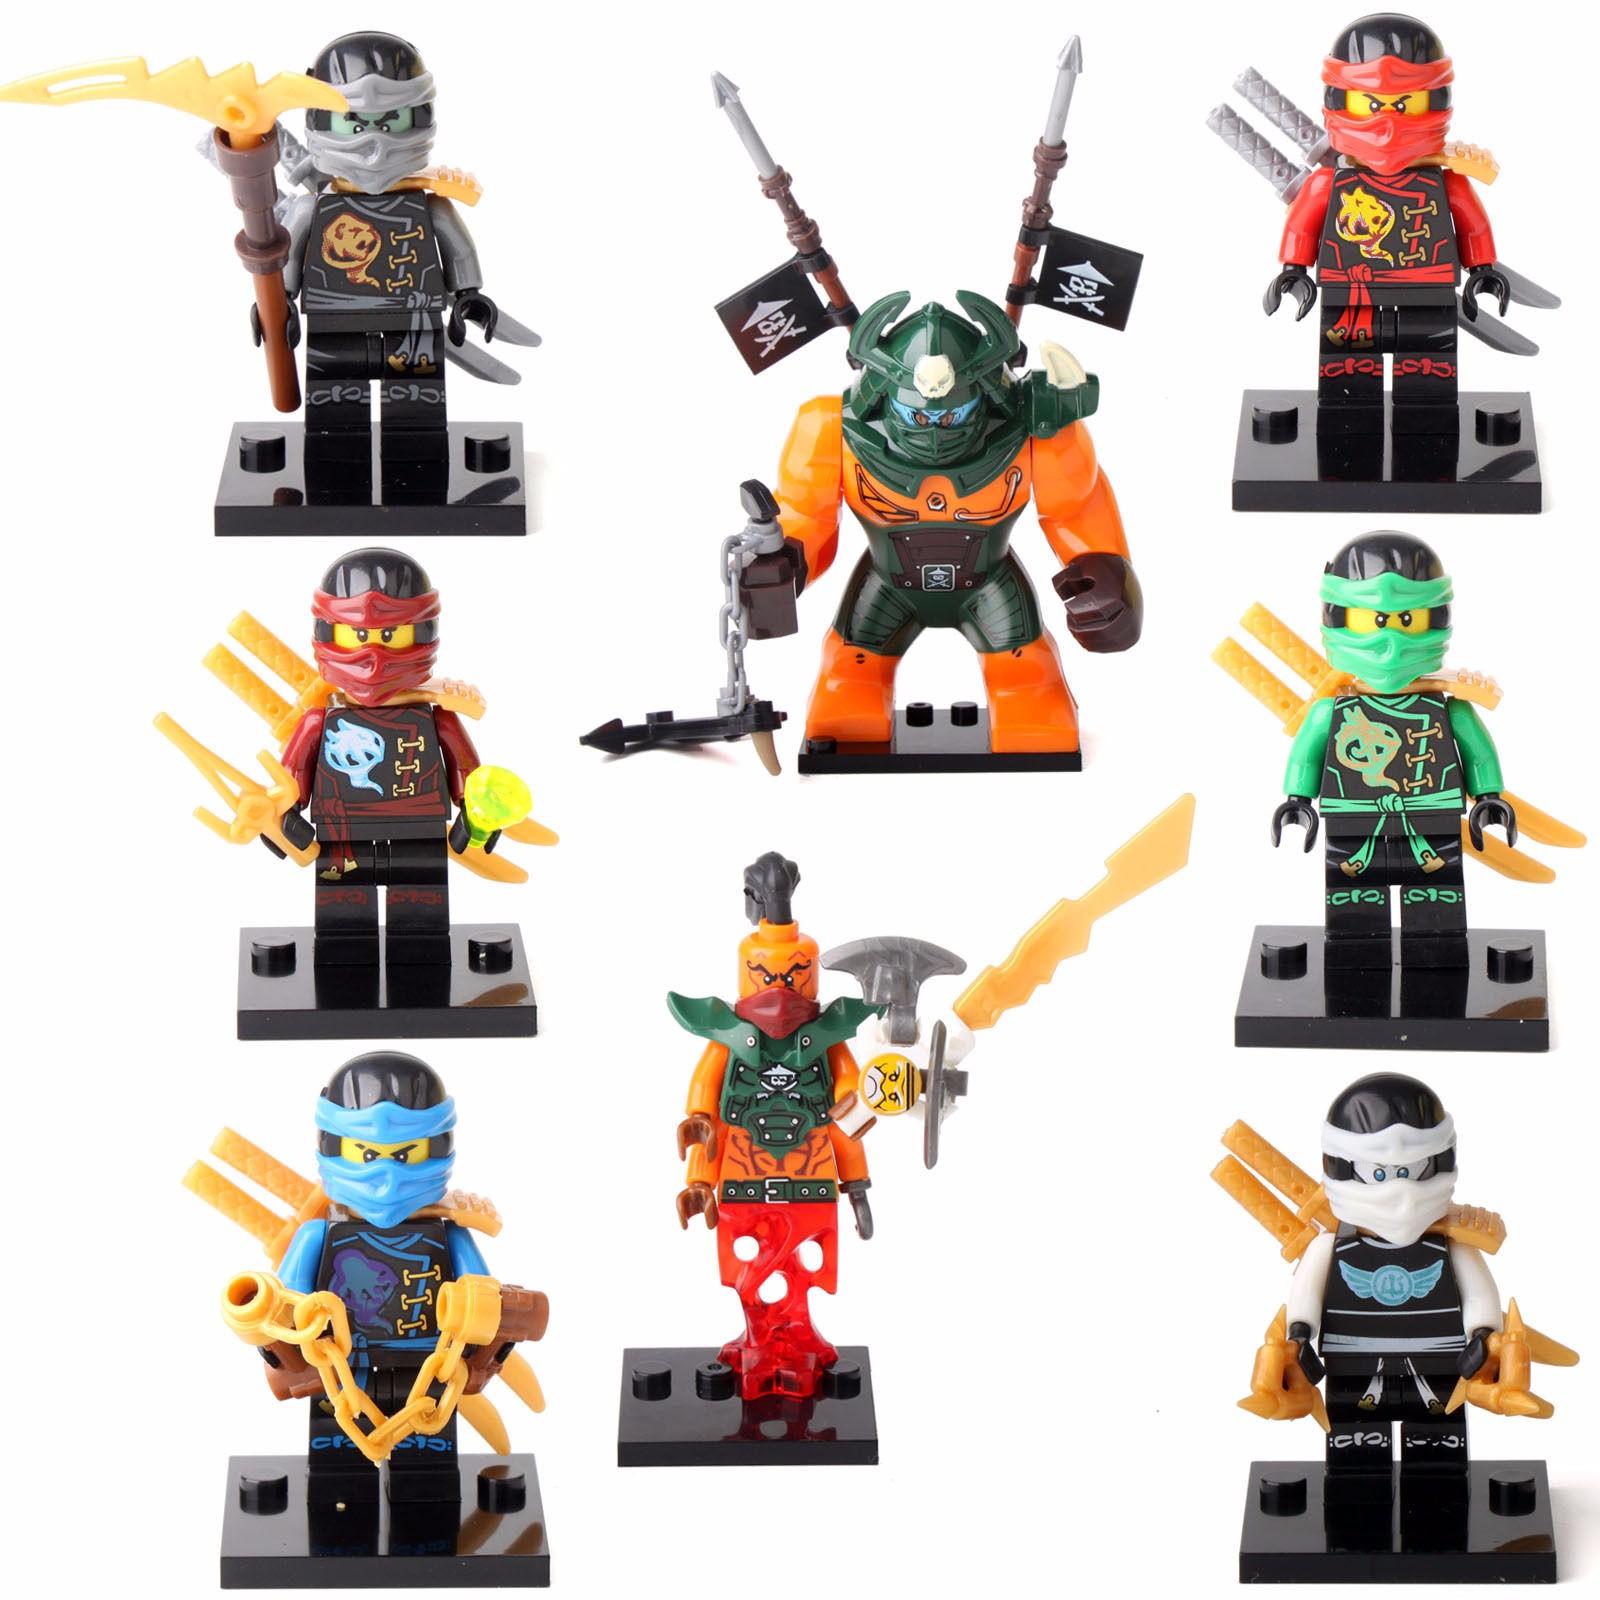 Lego Ninjago Toys : Pcs minifigures ninja ninjago jay cole lloyd dogshank